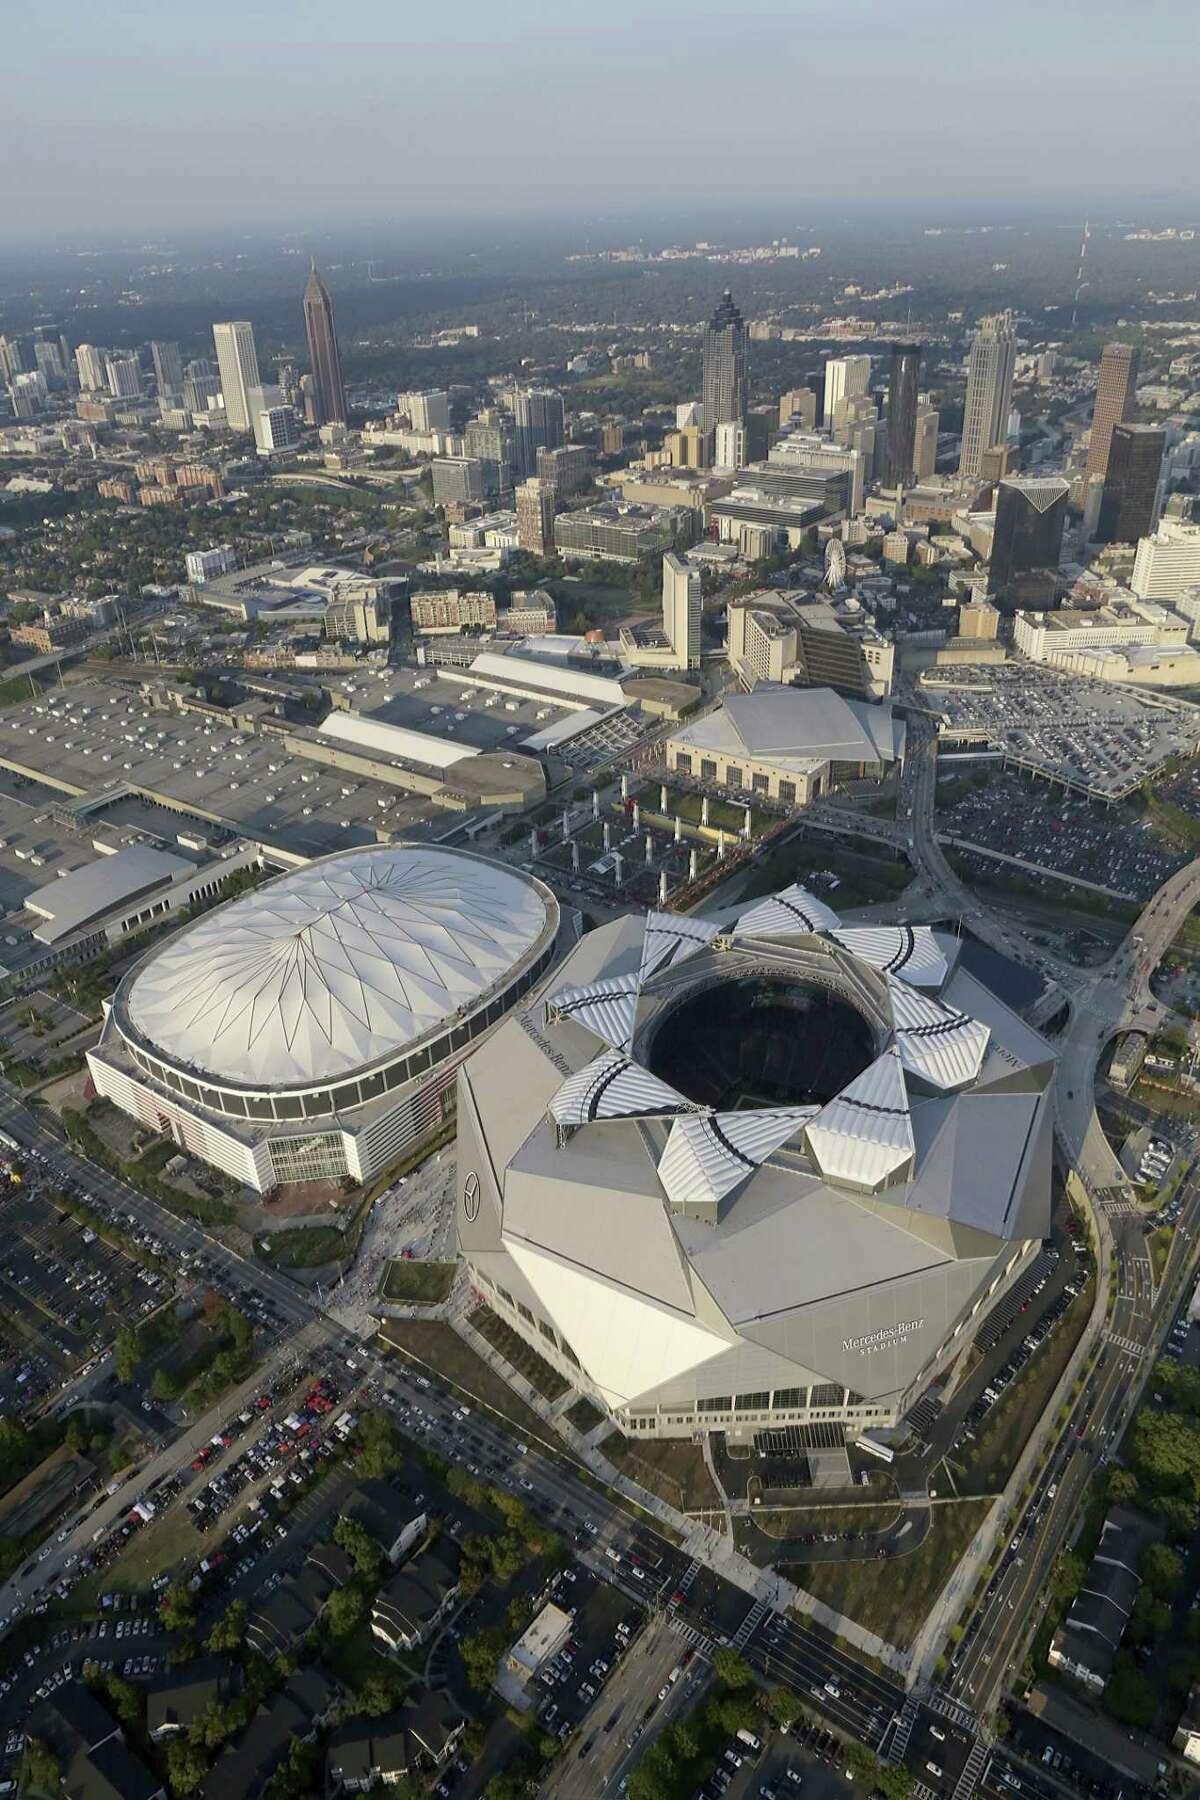 This aerial photo shows the Mercedes-Benz Stadium in Atlanta on Sunday, Sept. 17, 2017. (Akili-Casundria Ramsess/Atlanta Journal-Constitution via AP) ORG XMIT: GAATJ201 ORG XMIT: MER2017091720280660